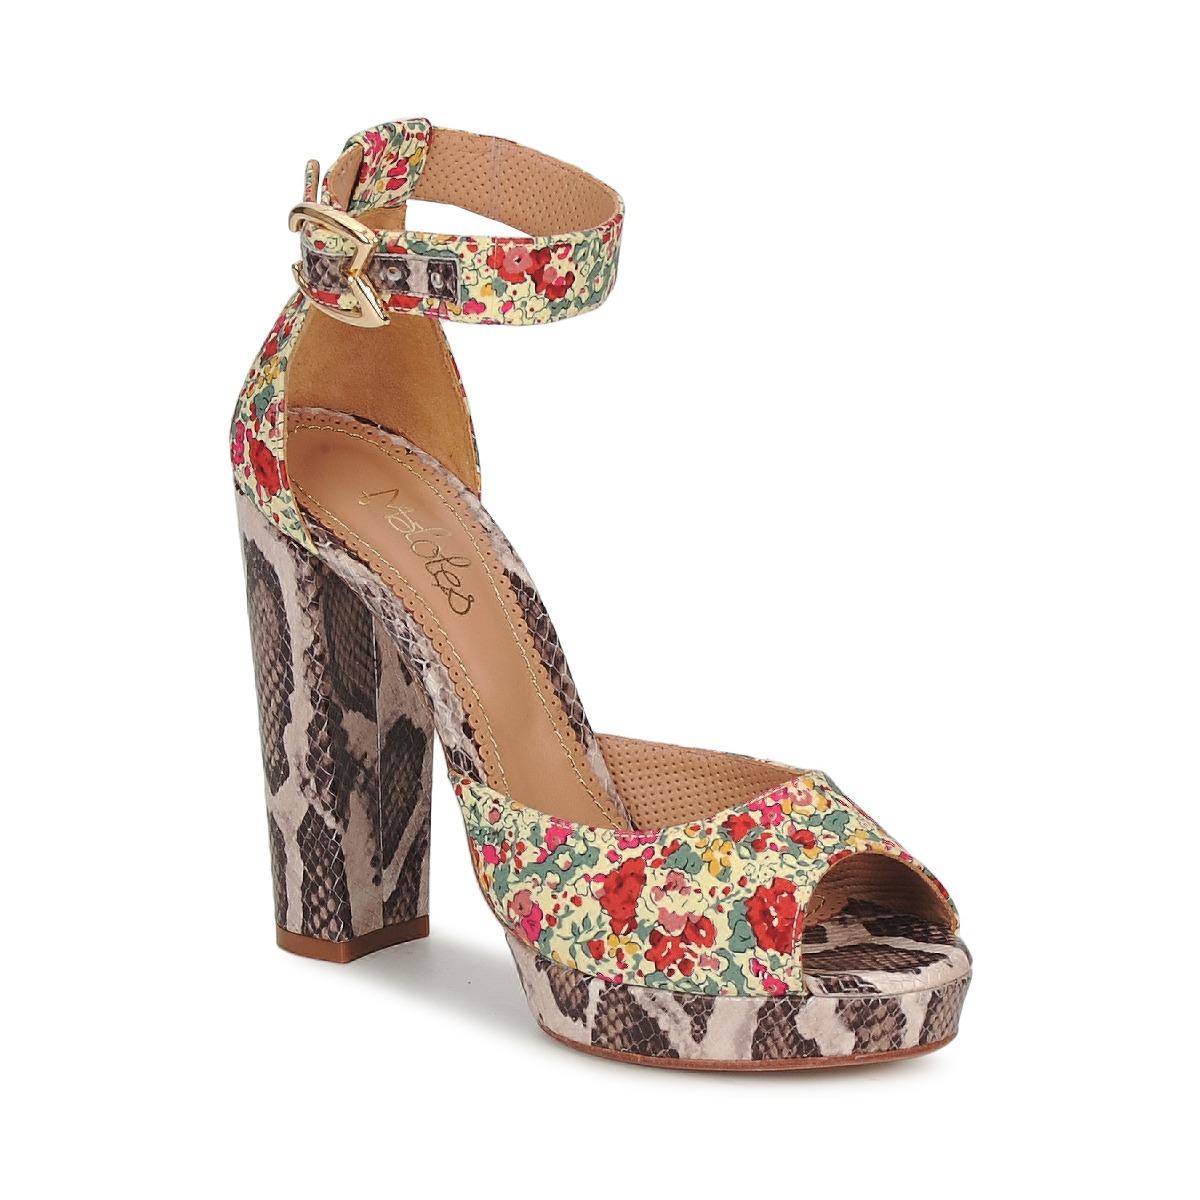 Maloles PIRIPI Multicolor - Kostenloser Versand bei Spartoode ! - Schuhe Sandalen / Sandaletten Damen 134,50 €